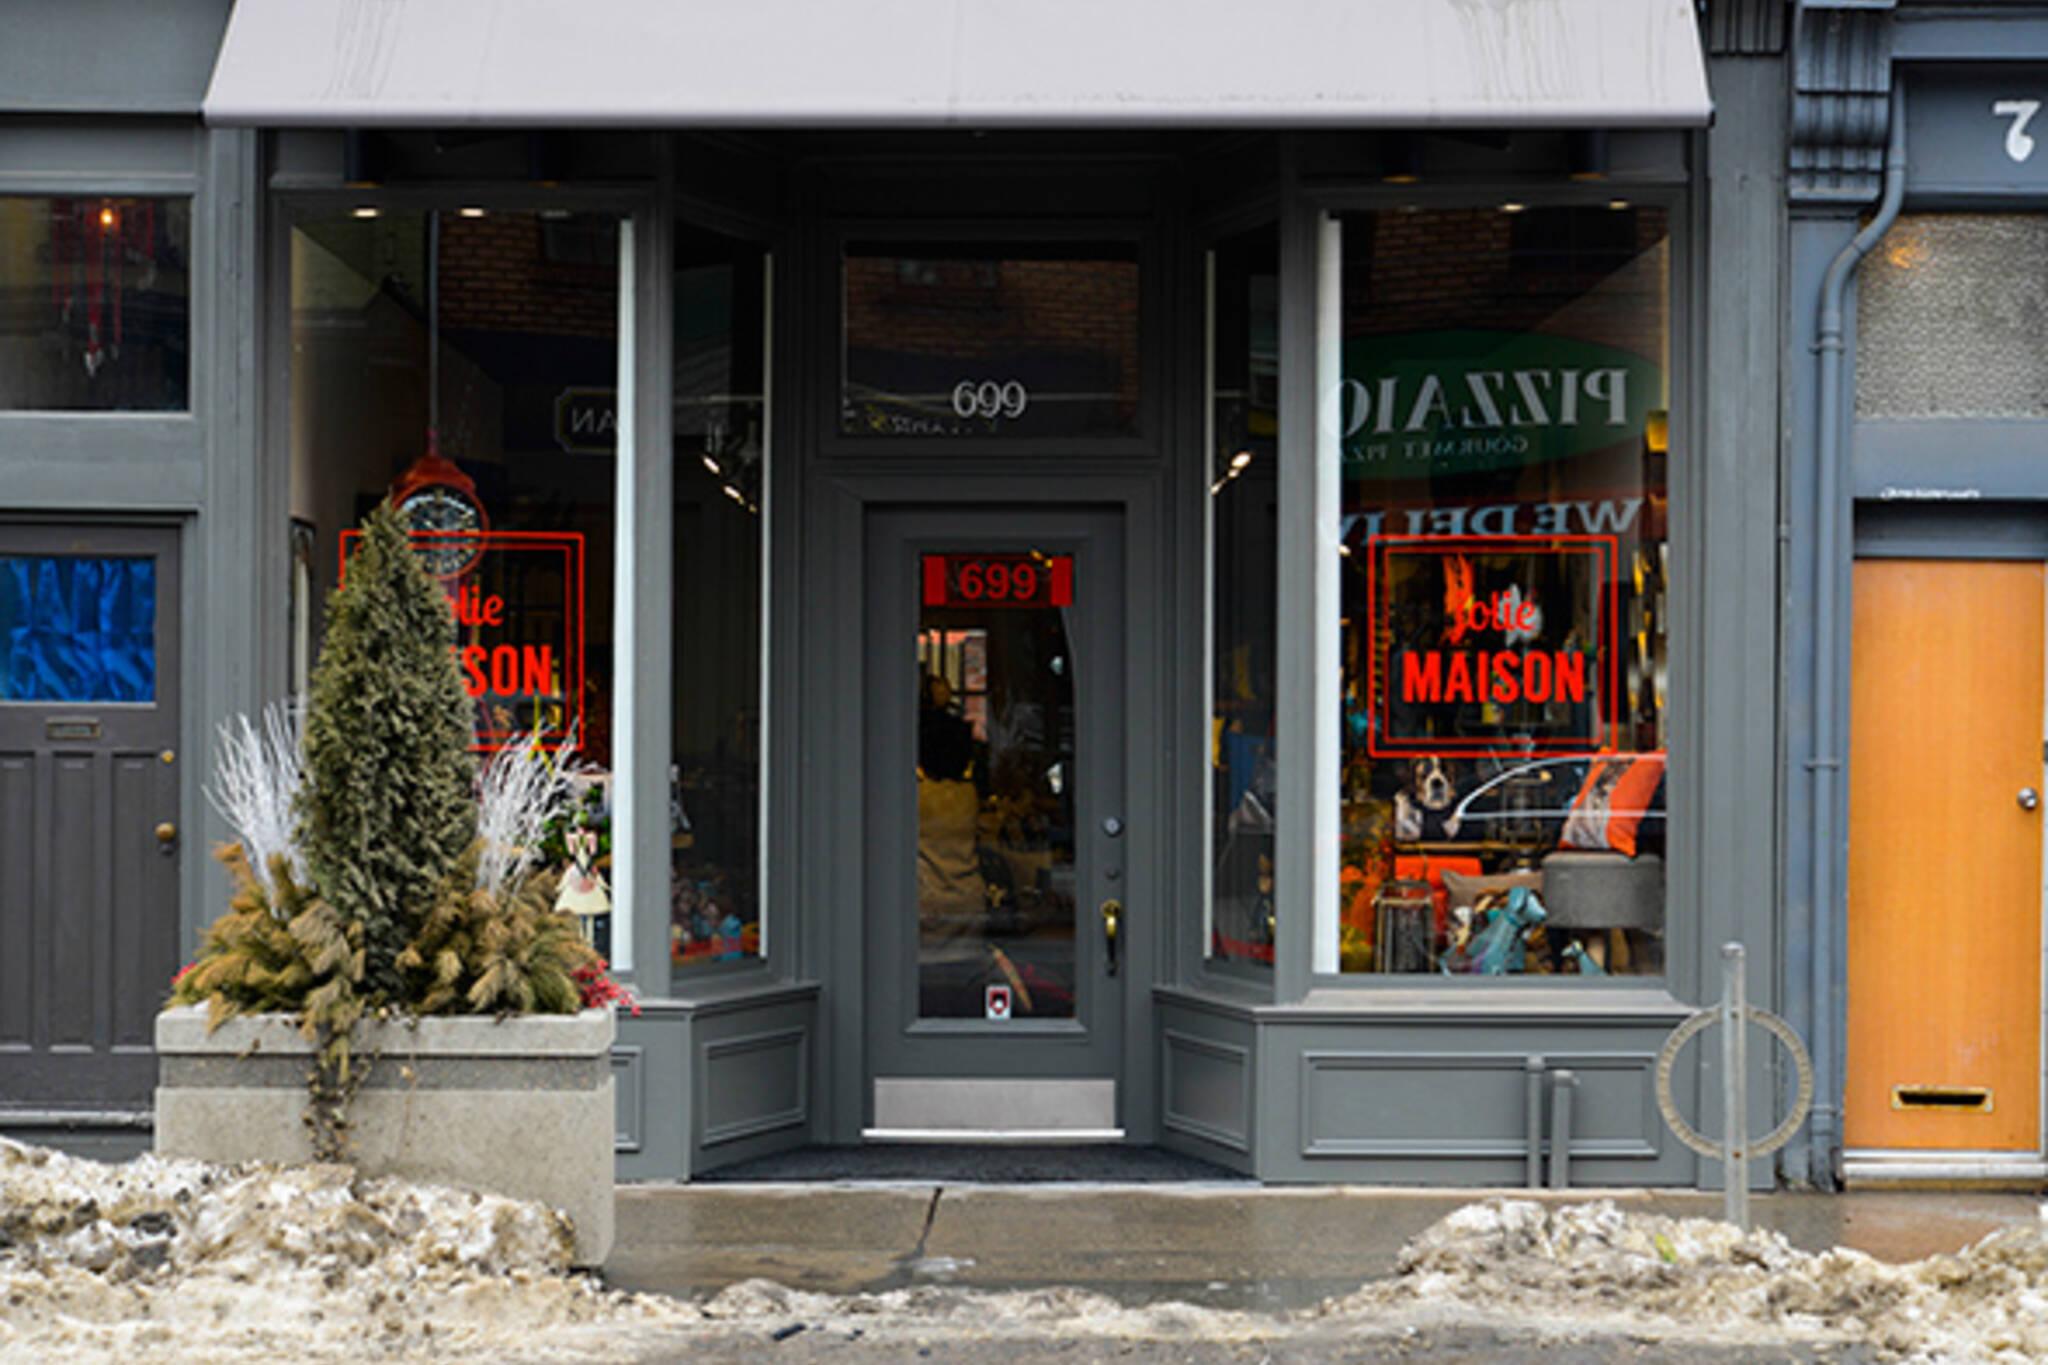 Jolie Maison - blogTO - Toronto